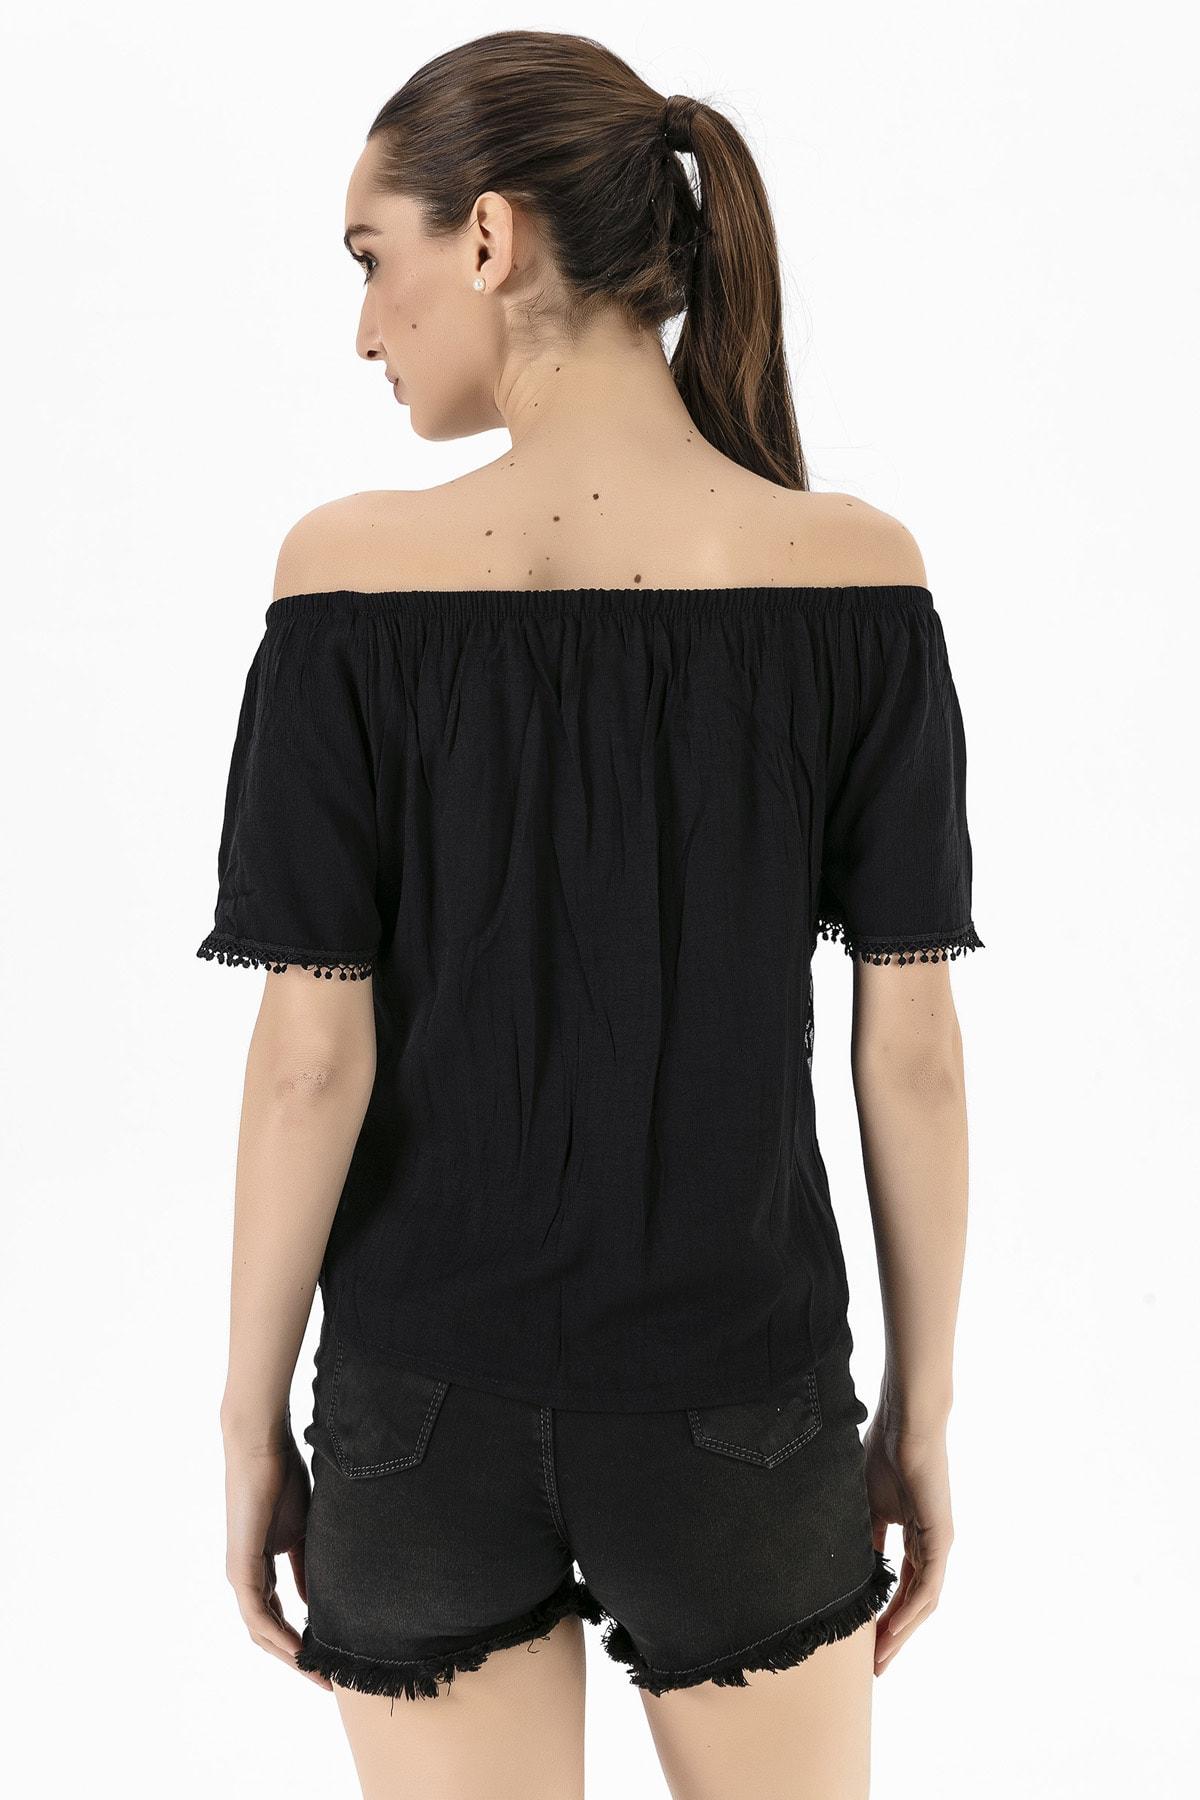 EMJEY Kadın Siyah Madonna Yaka Dantel Bluz She020Y010018 3